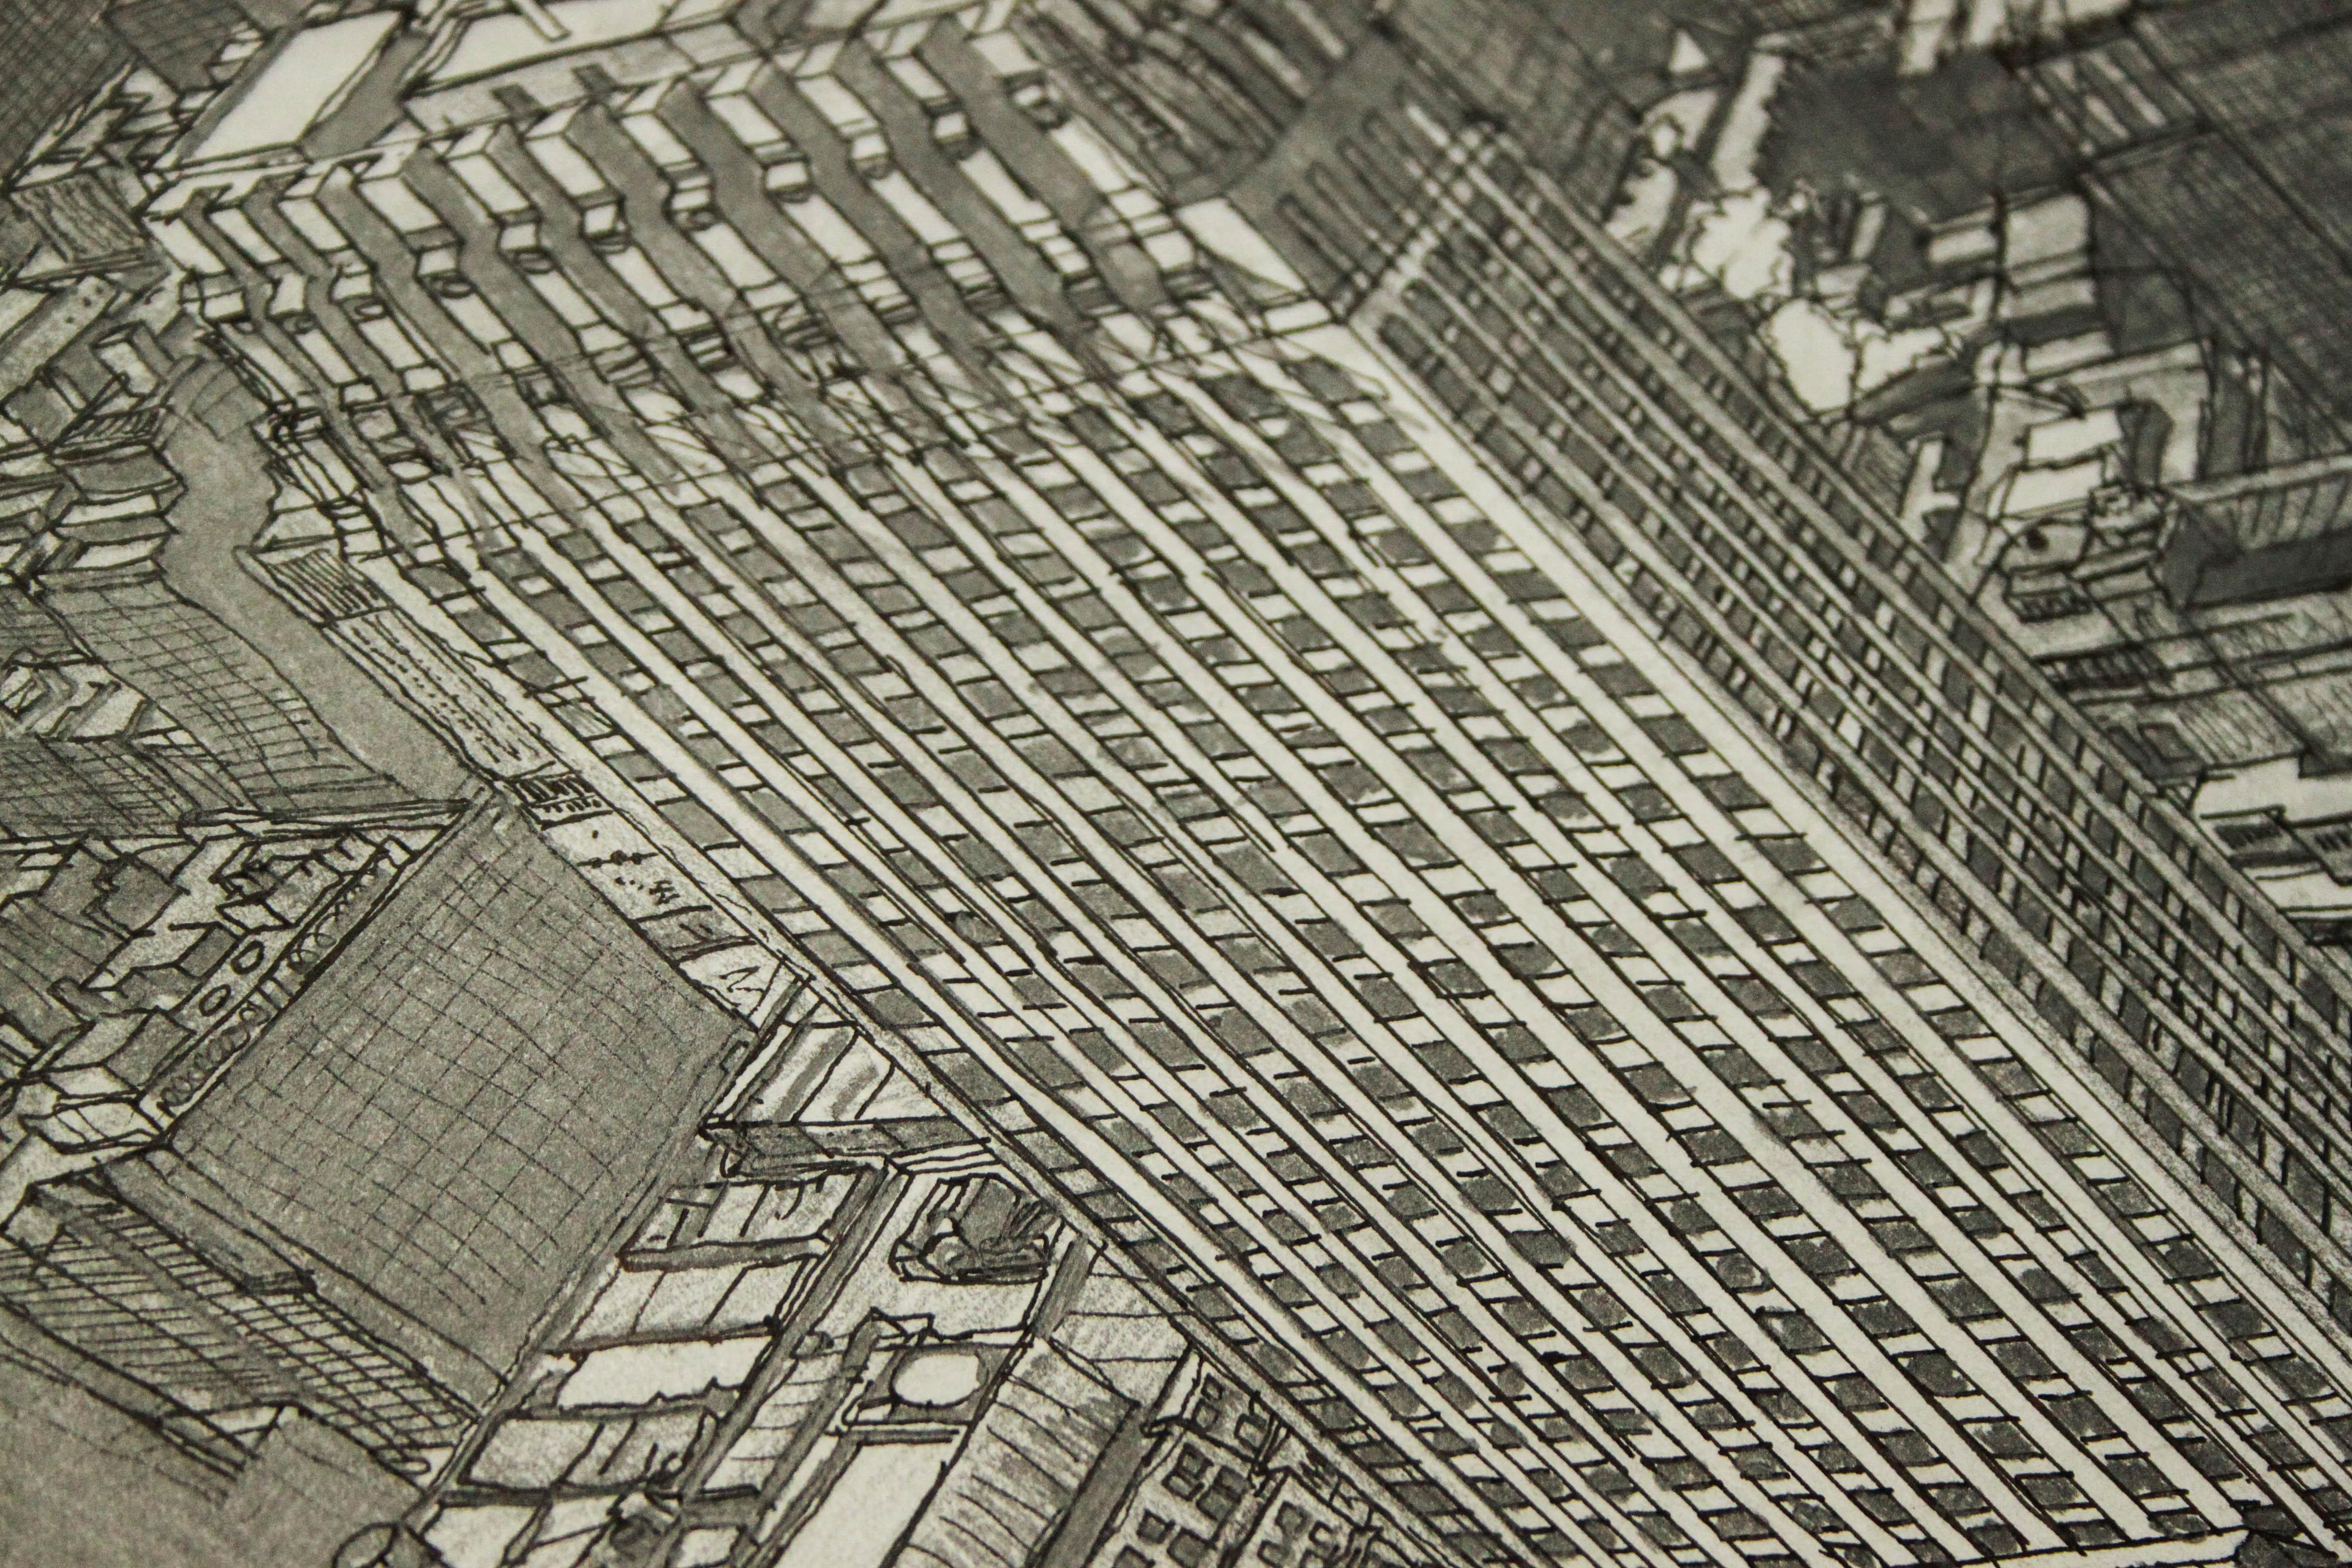 David Bassadone New York National Geographic 1930_2021 detail